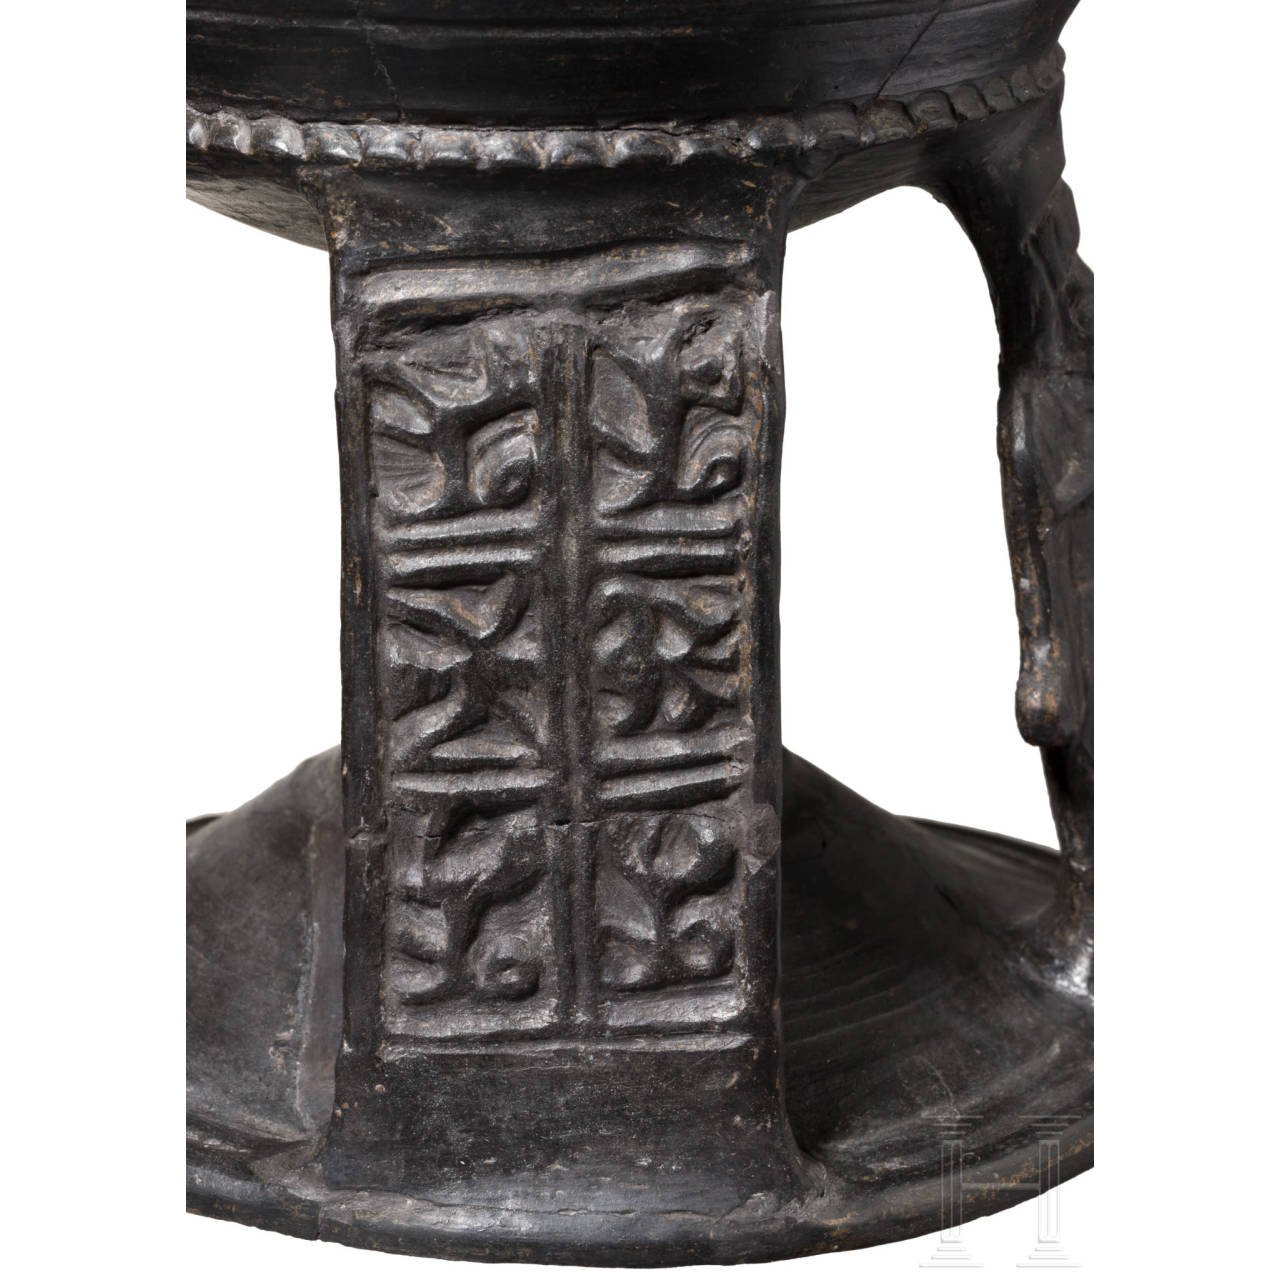 An Etruscan bucchero calix, late 7th century B.C.